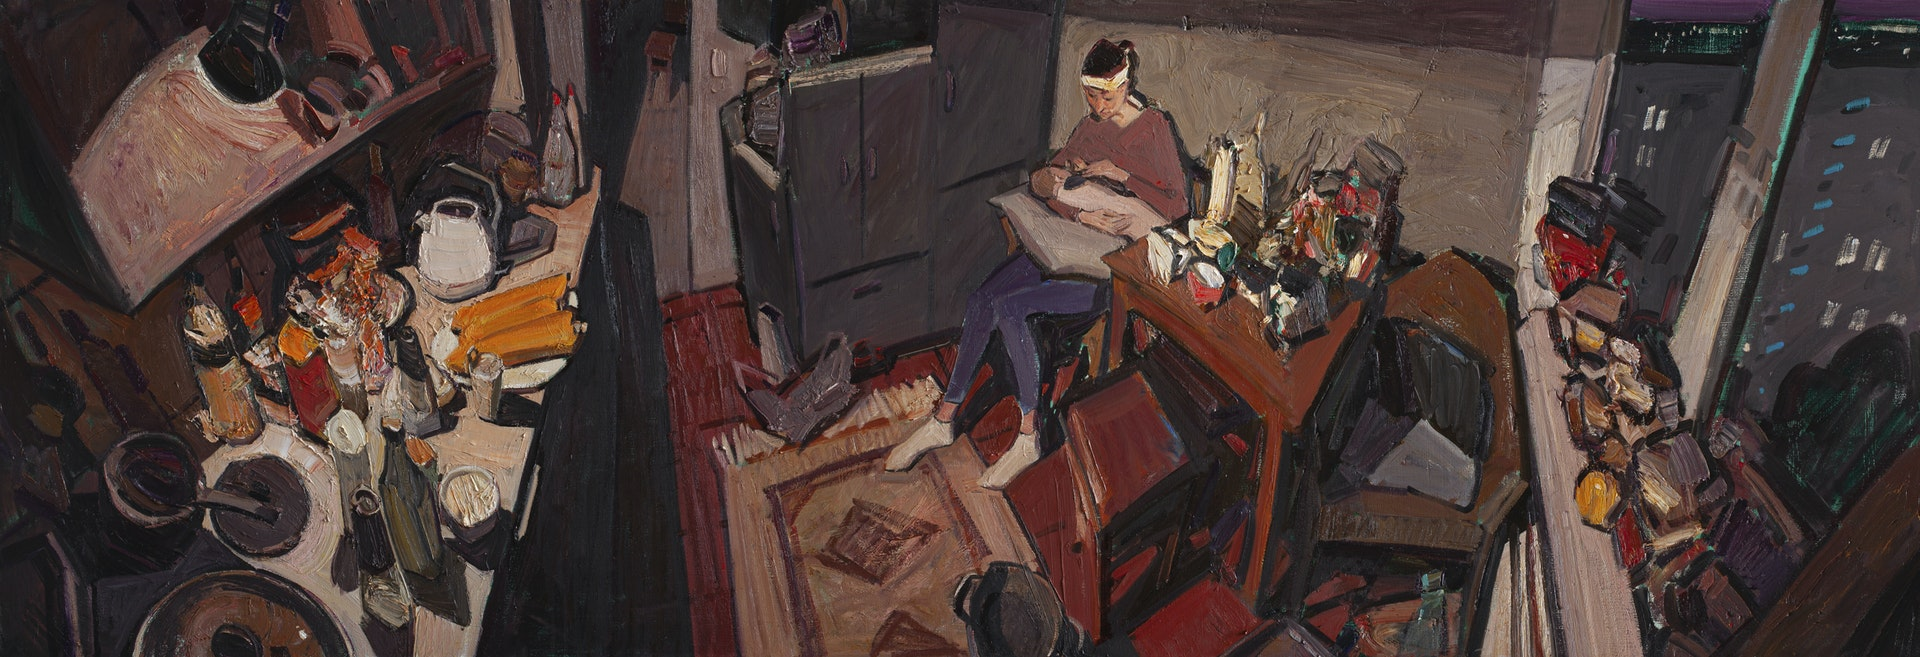 'In the kitchen tonight', Sayan Baigaliyev, Oil on canvas, 80 x 230 cm